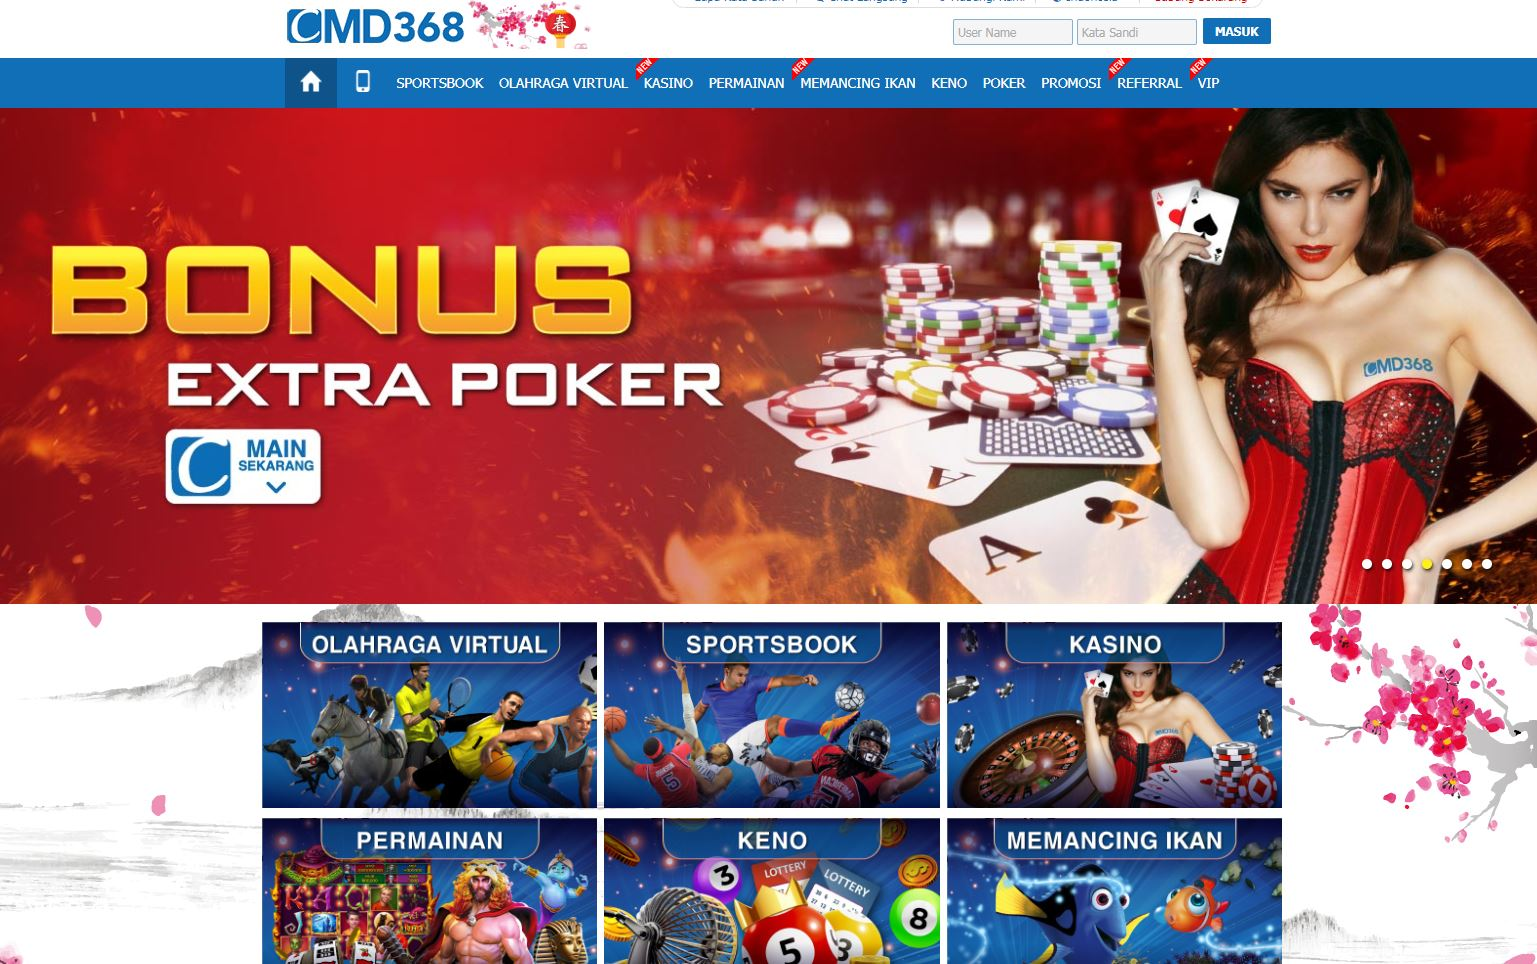 CMD368 Situs Judi Online, Judi Bola, Domino Qiu Qiu, Daftar Judi Bola, Agen Judi Bola Terpercaya